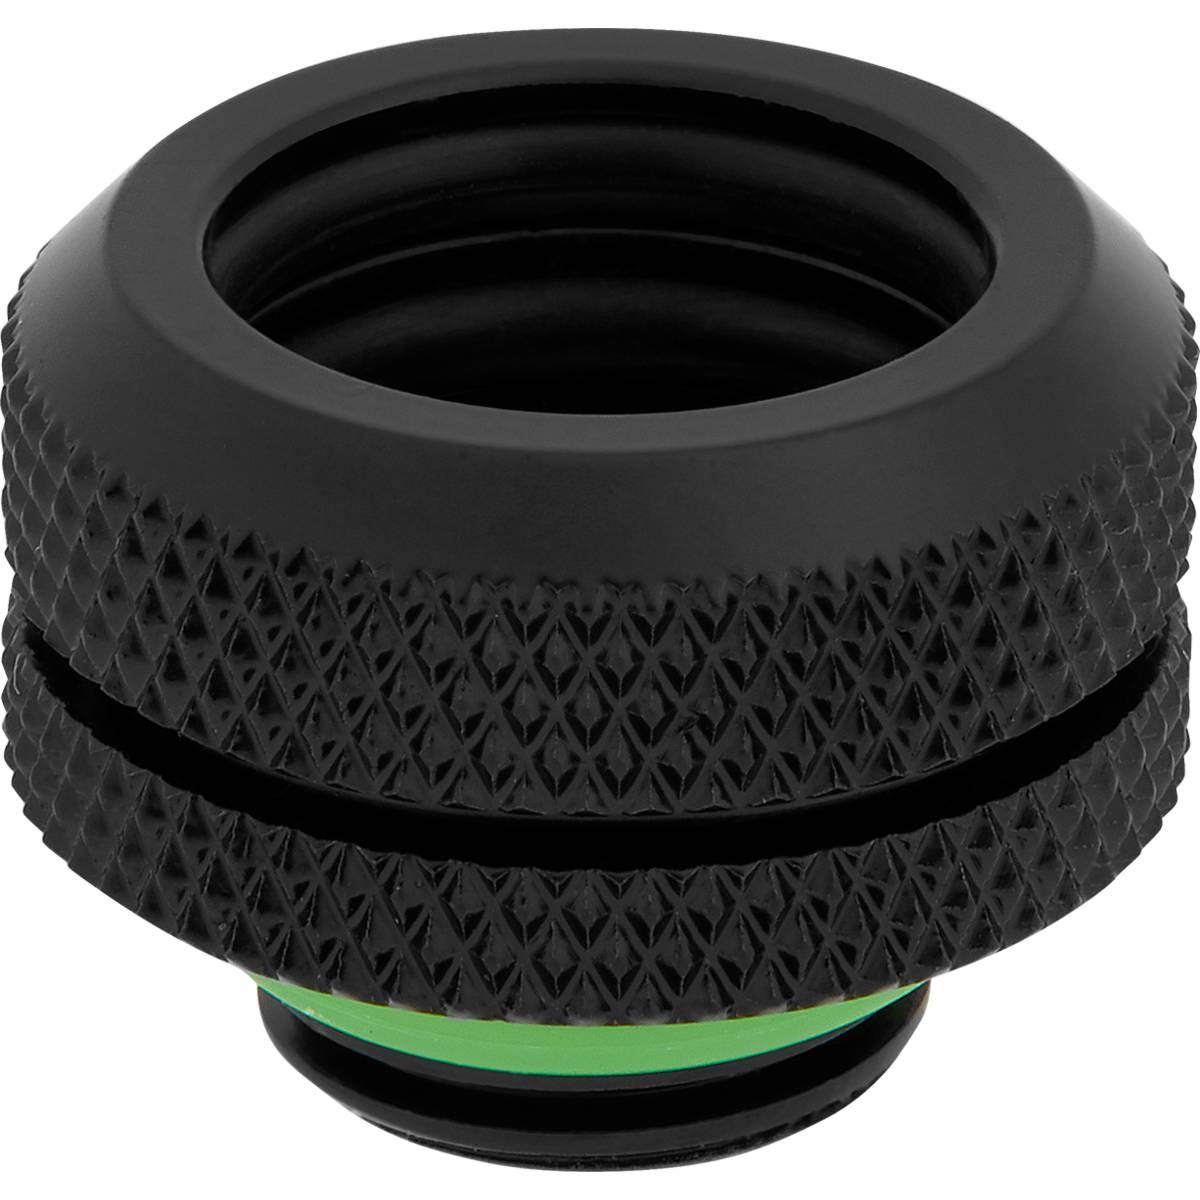 CORSAIR Hydro X Series XF Hardline 14mm OD Fitting Four Pack - Black